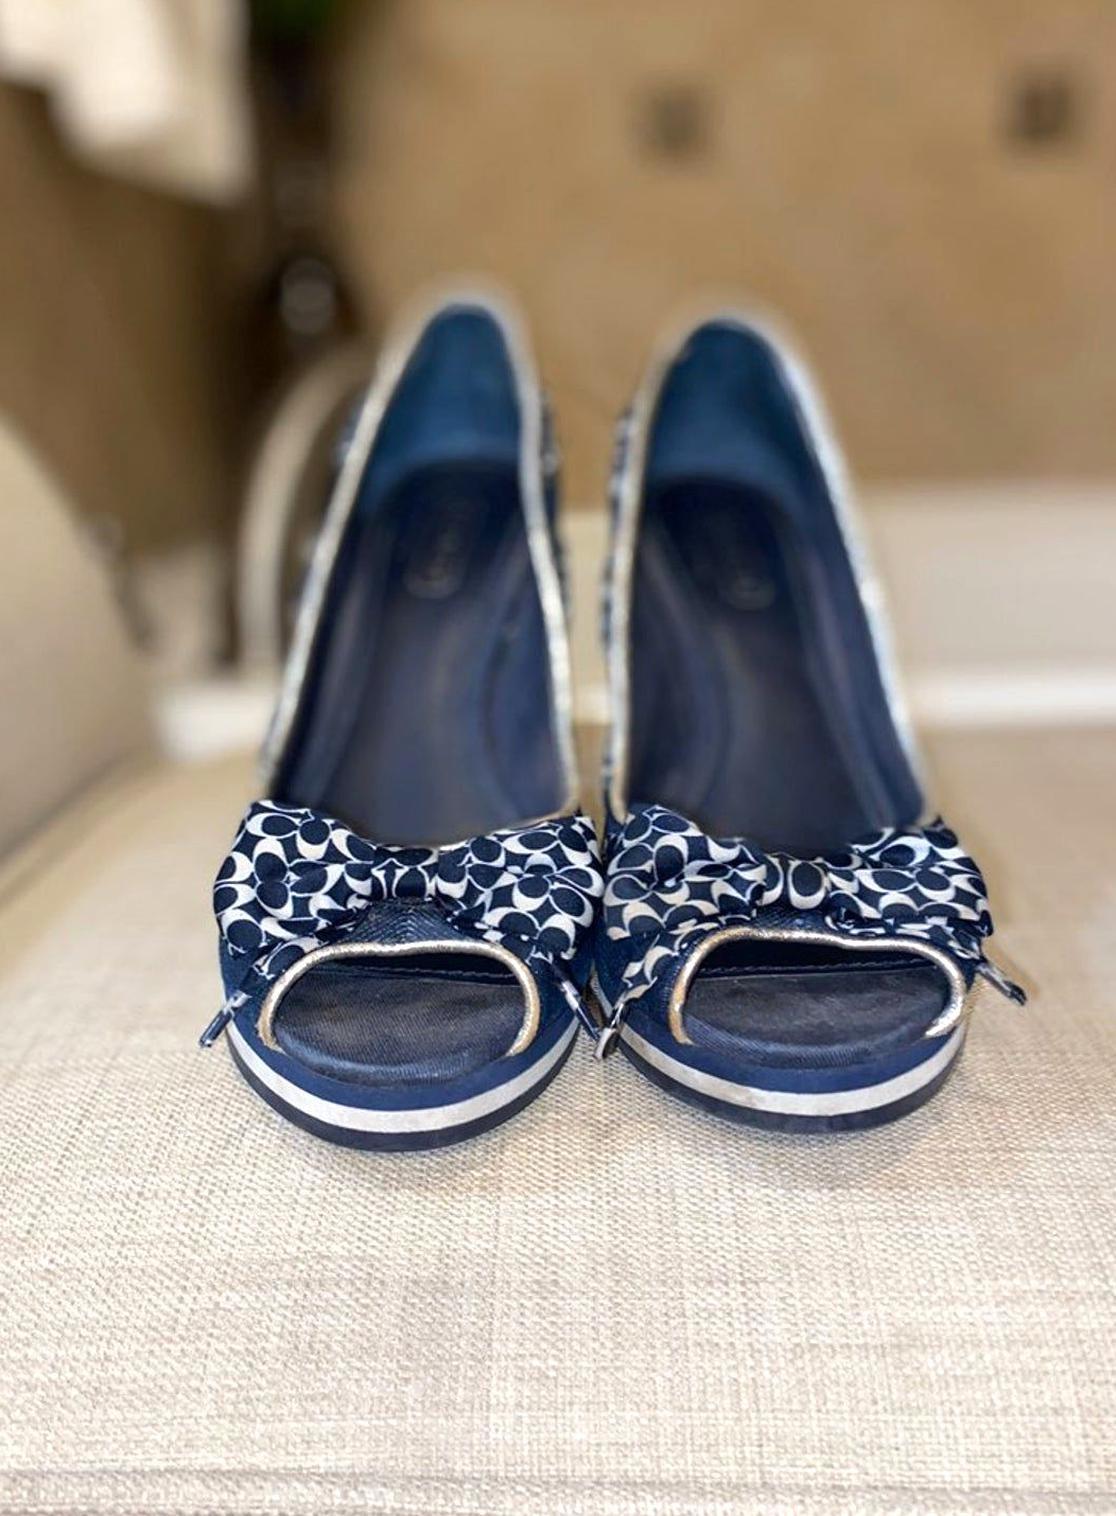 Coach navy blue wedge high heel in 2020 navy blue wedges